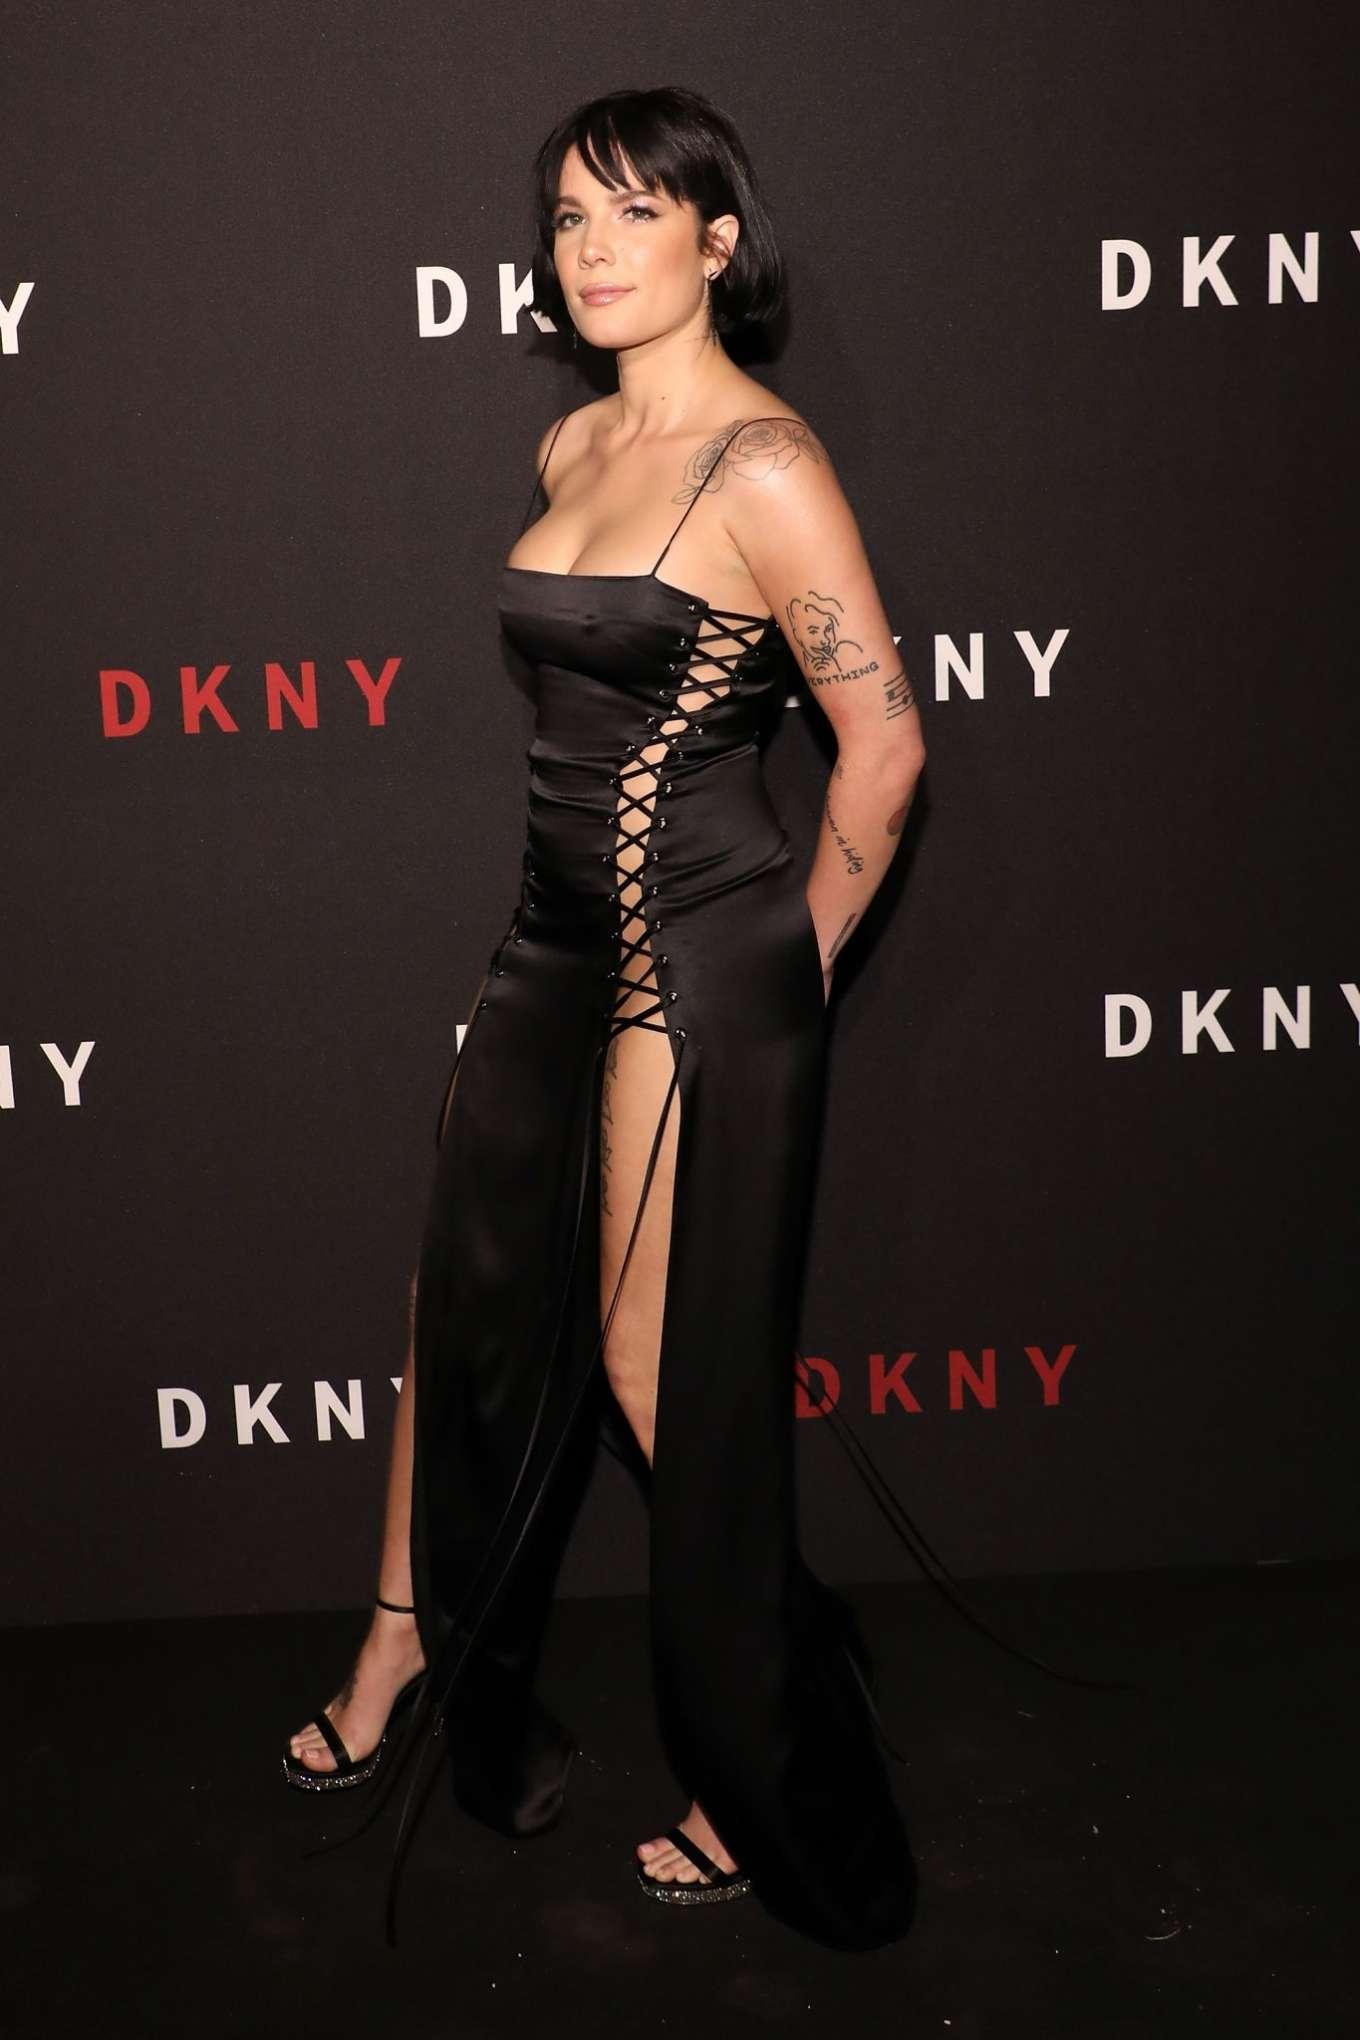 Halsey 2019 : Halsey – 30th anniversary of DKNY Party-22